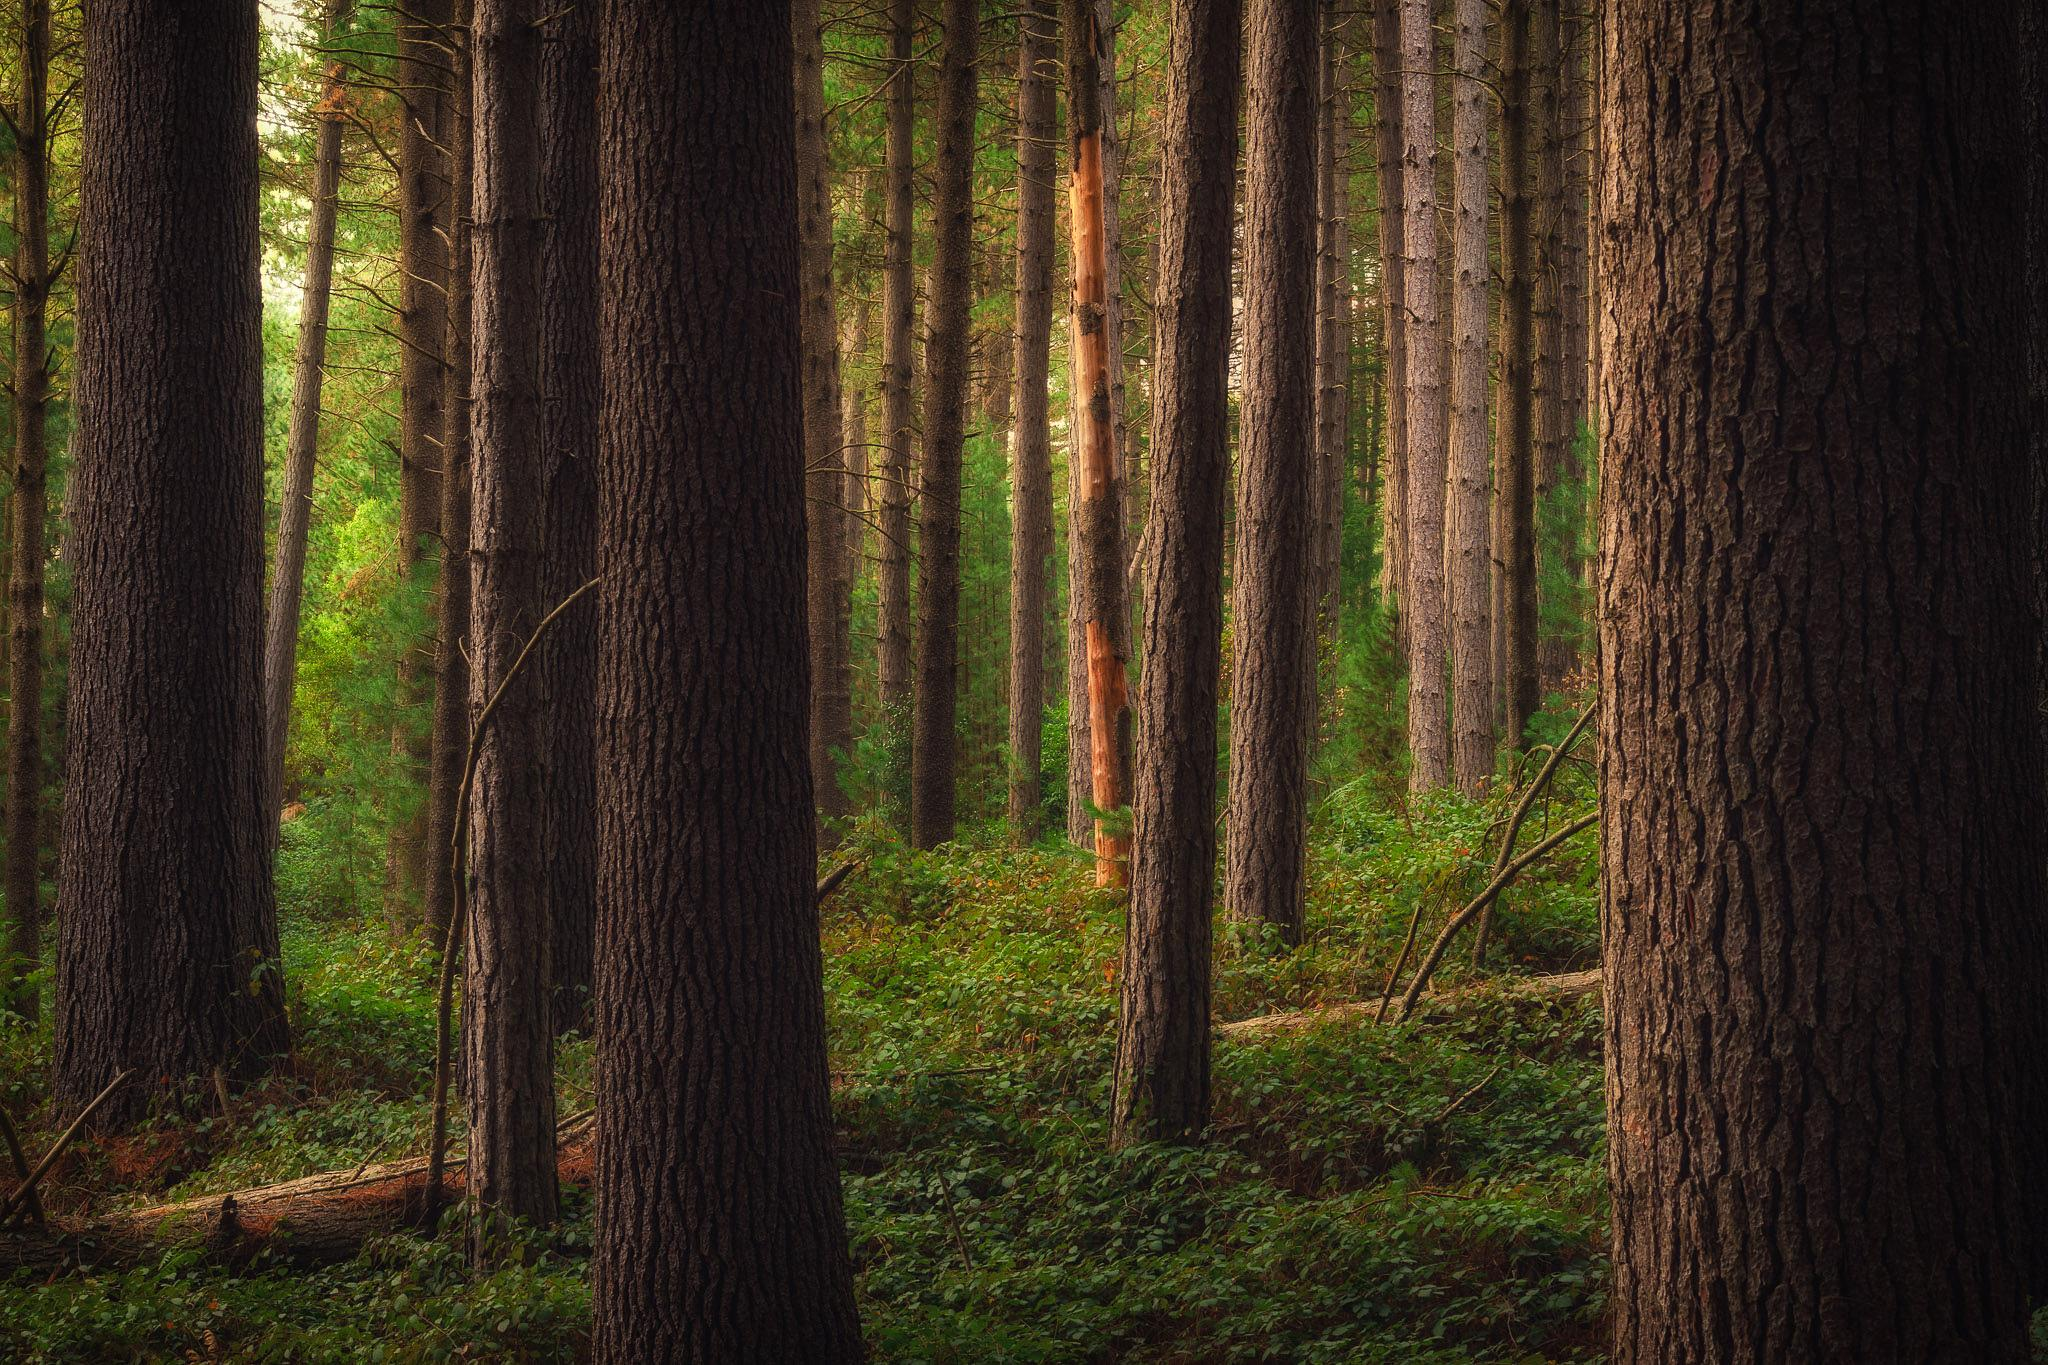 Sugar Pine Forest - Laurel Hill by Erich Anderson